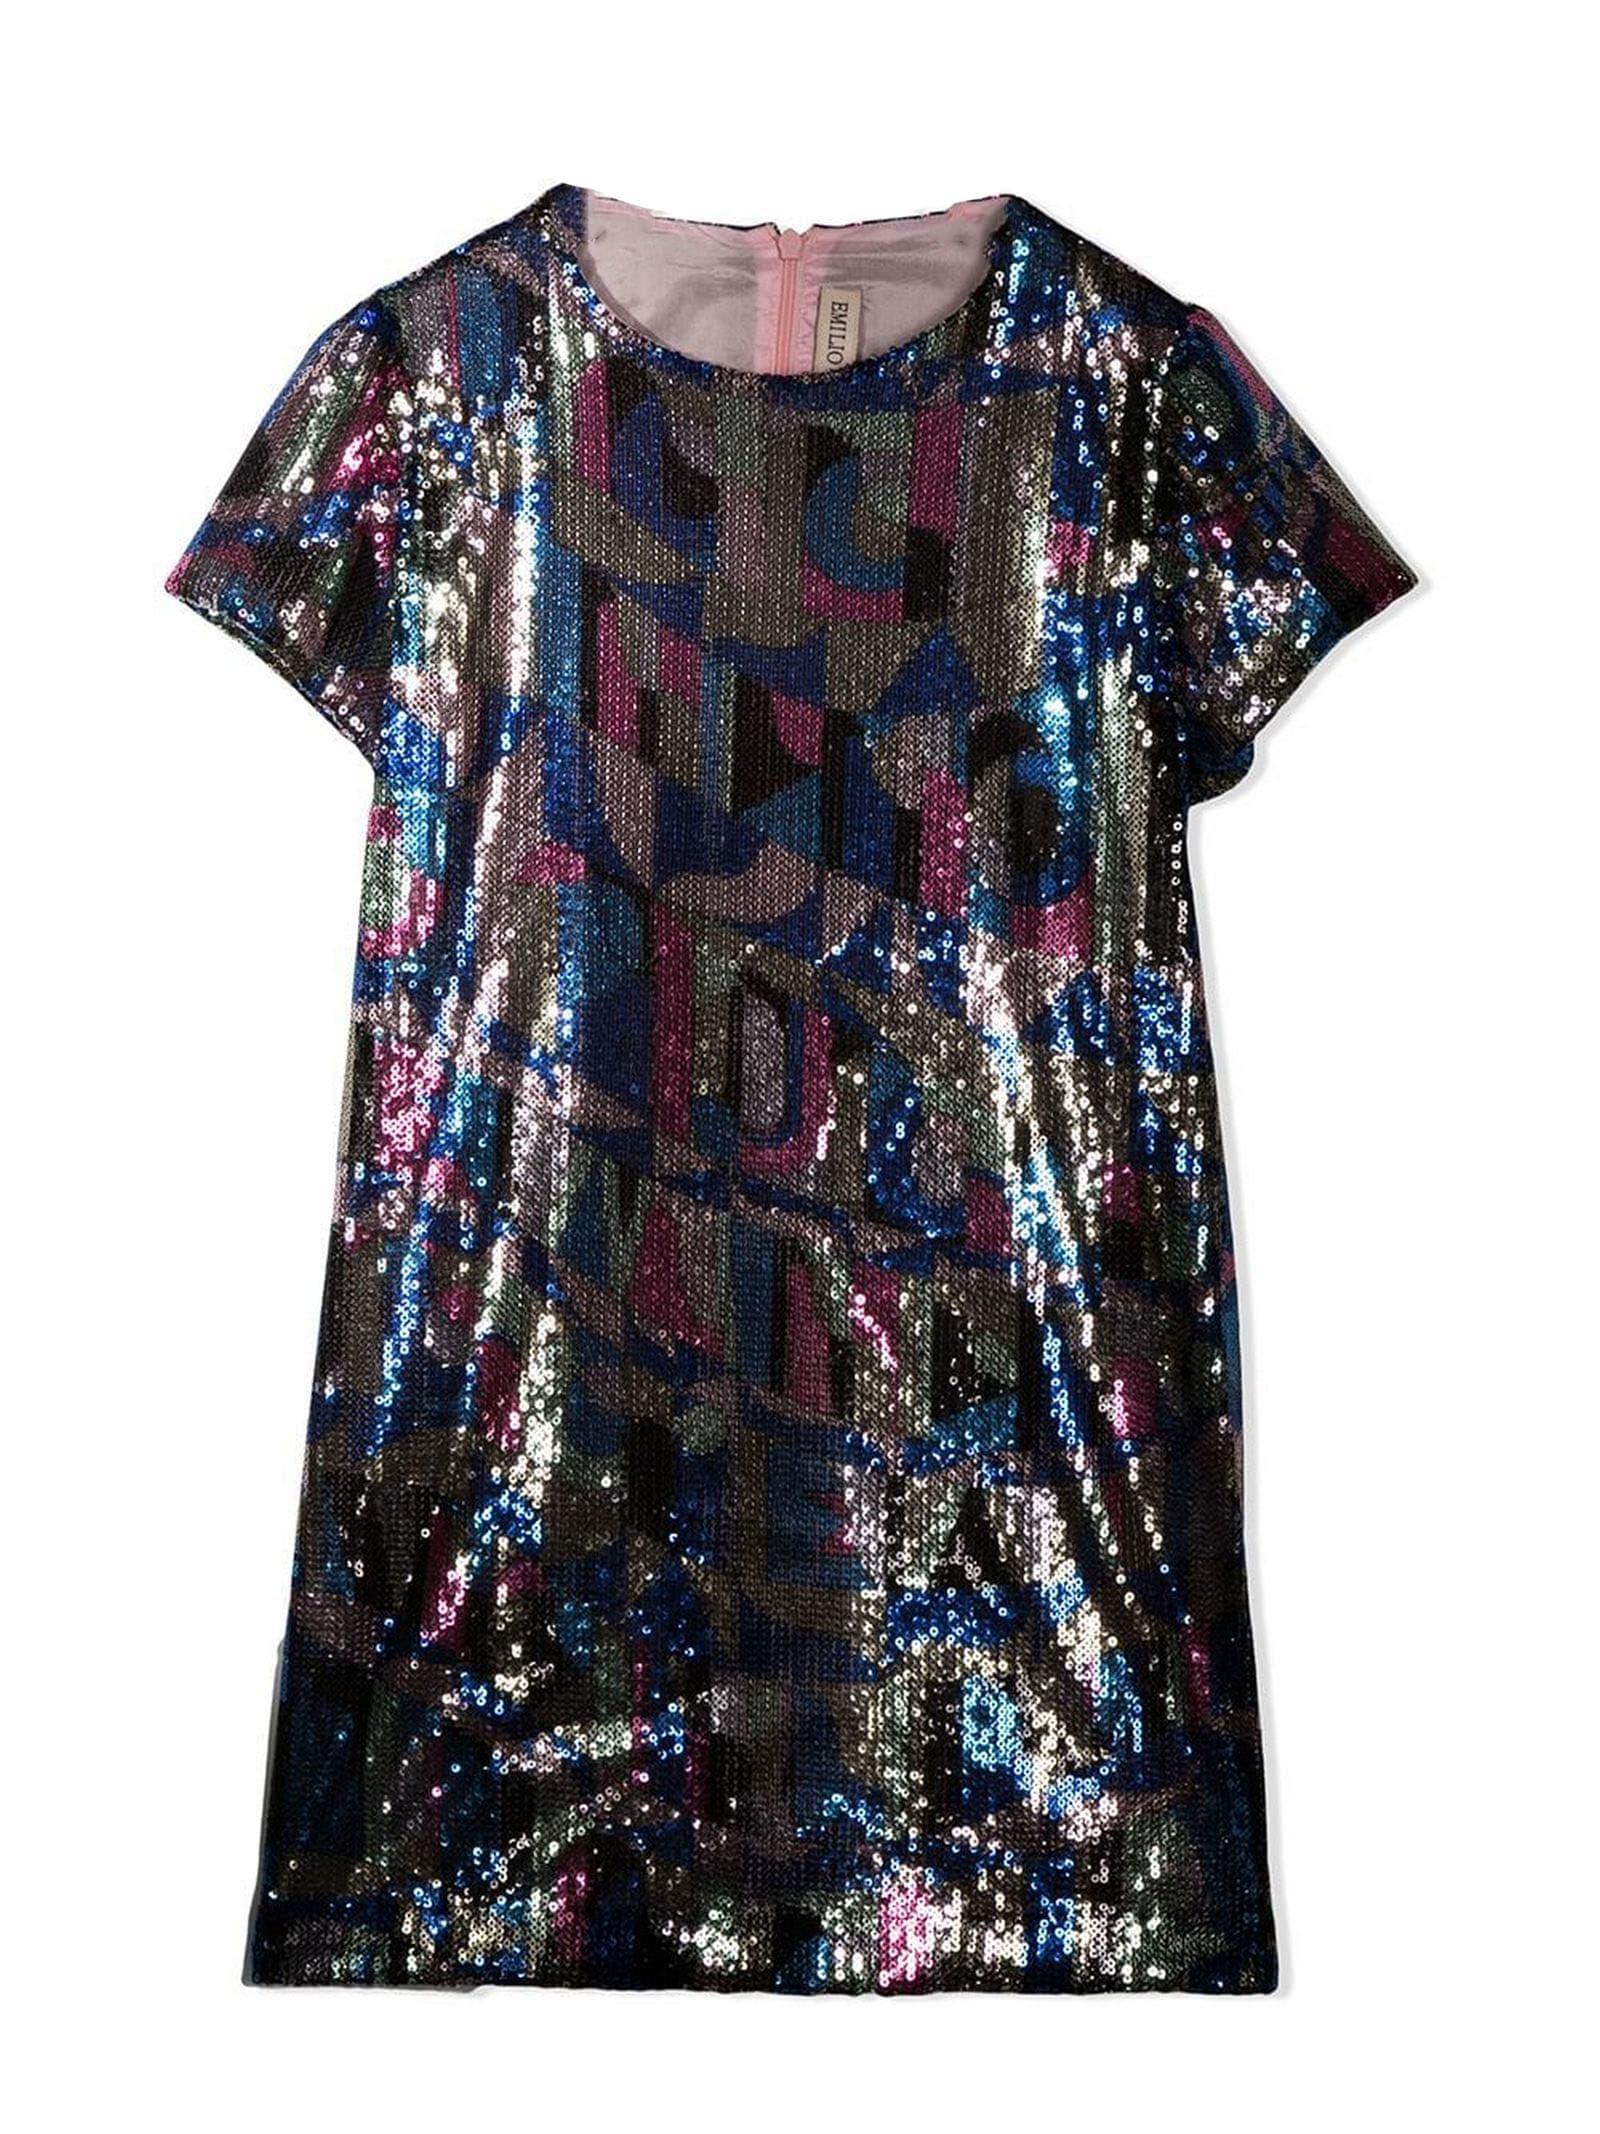 Emilio Pucci Sequinned Geometric Dress